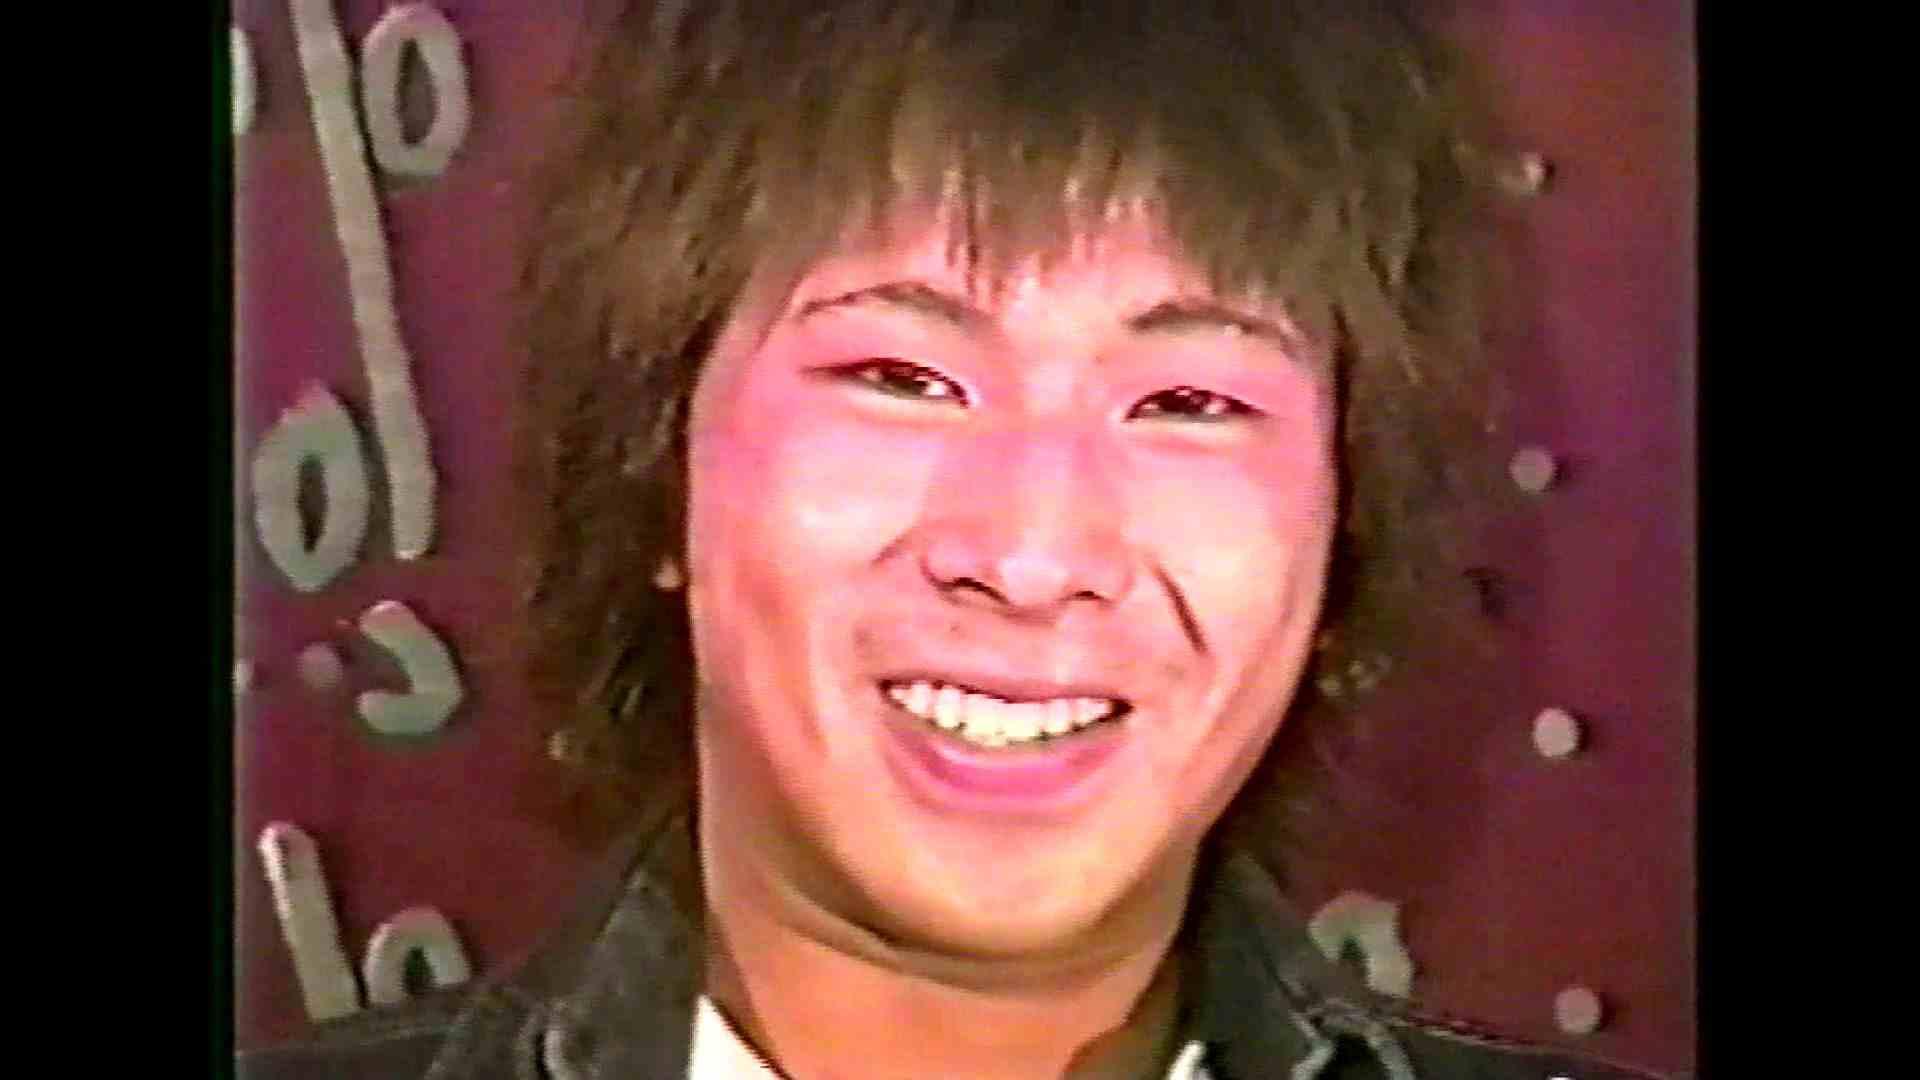 GAYBOY宏のオカズ倉庫Vol.3-1 オナニー 男同士画像 98pic 43